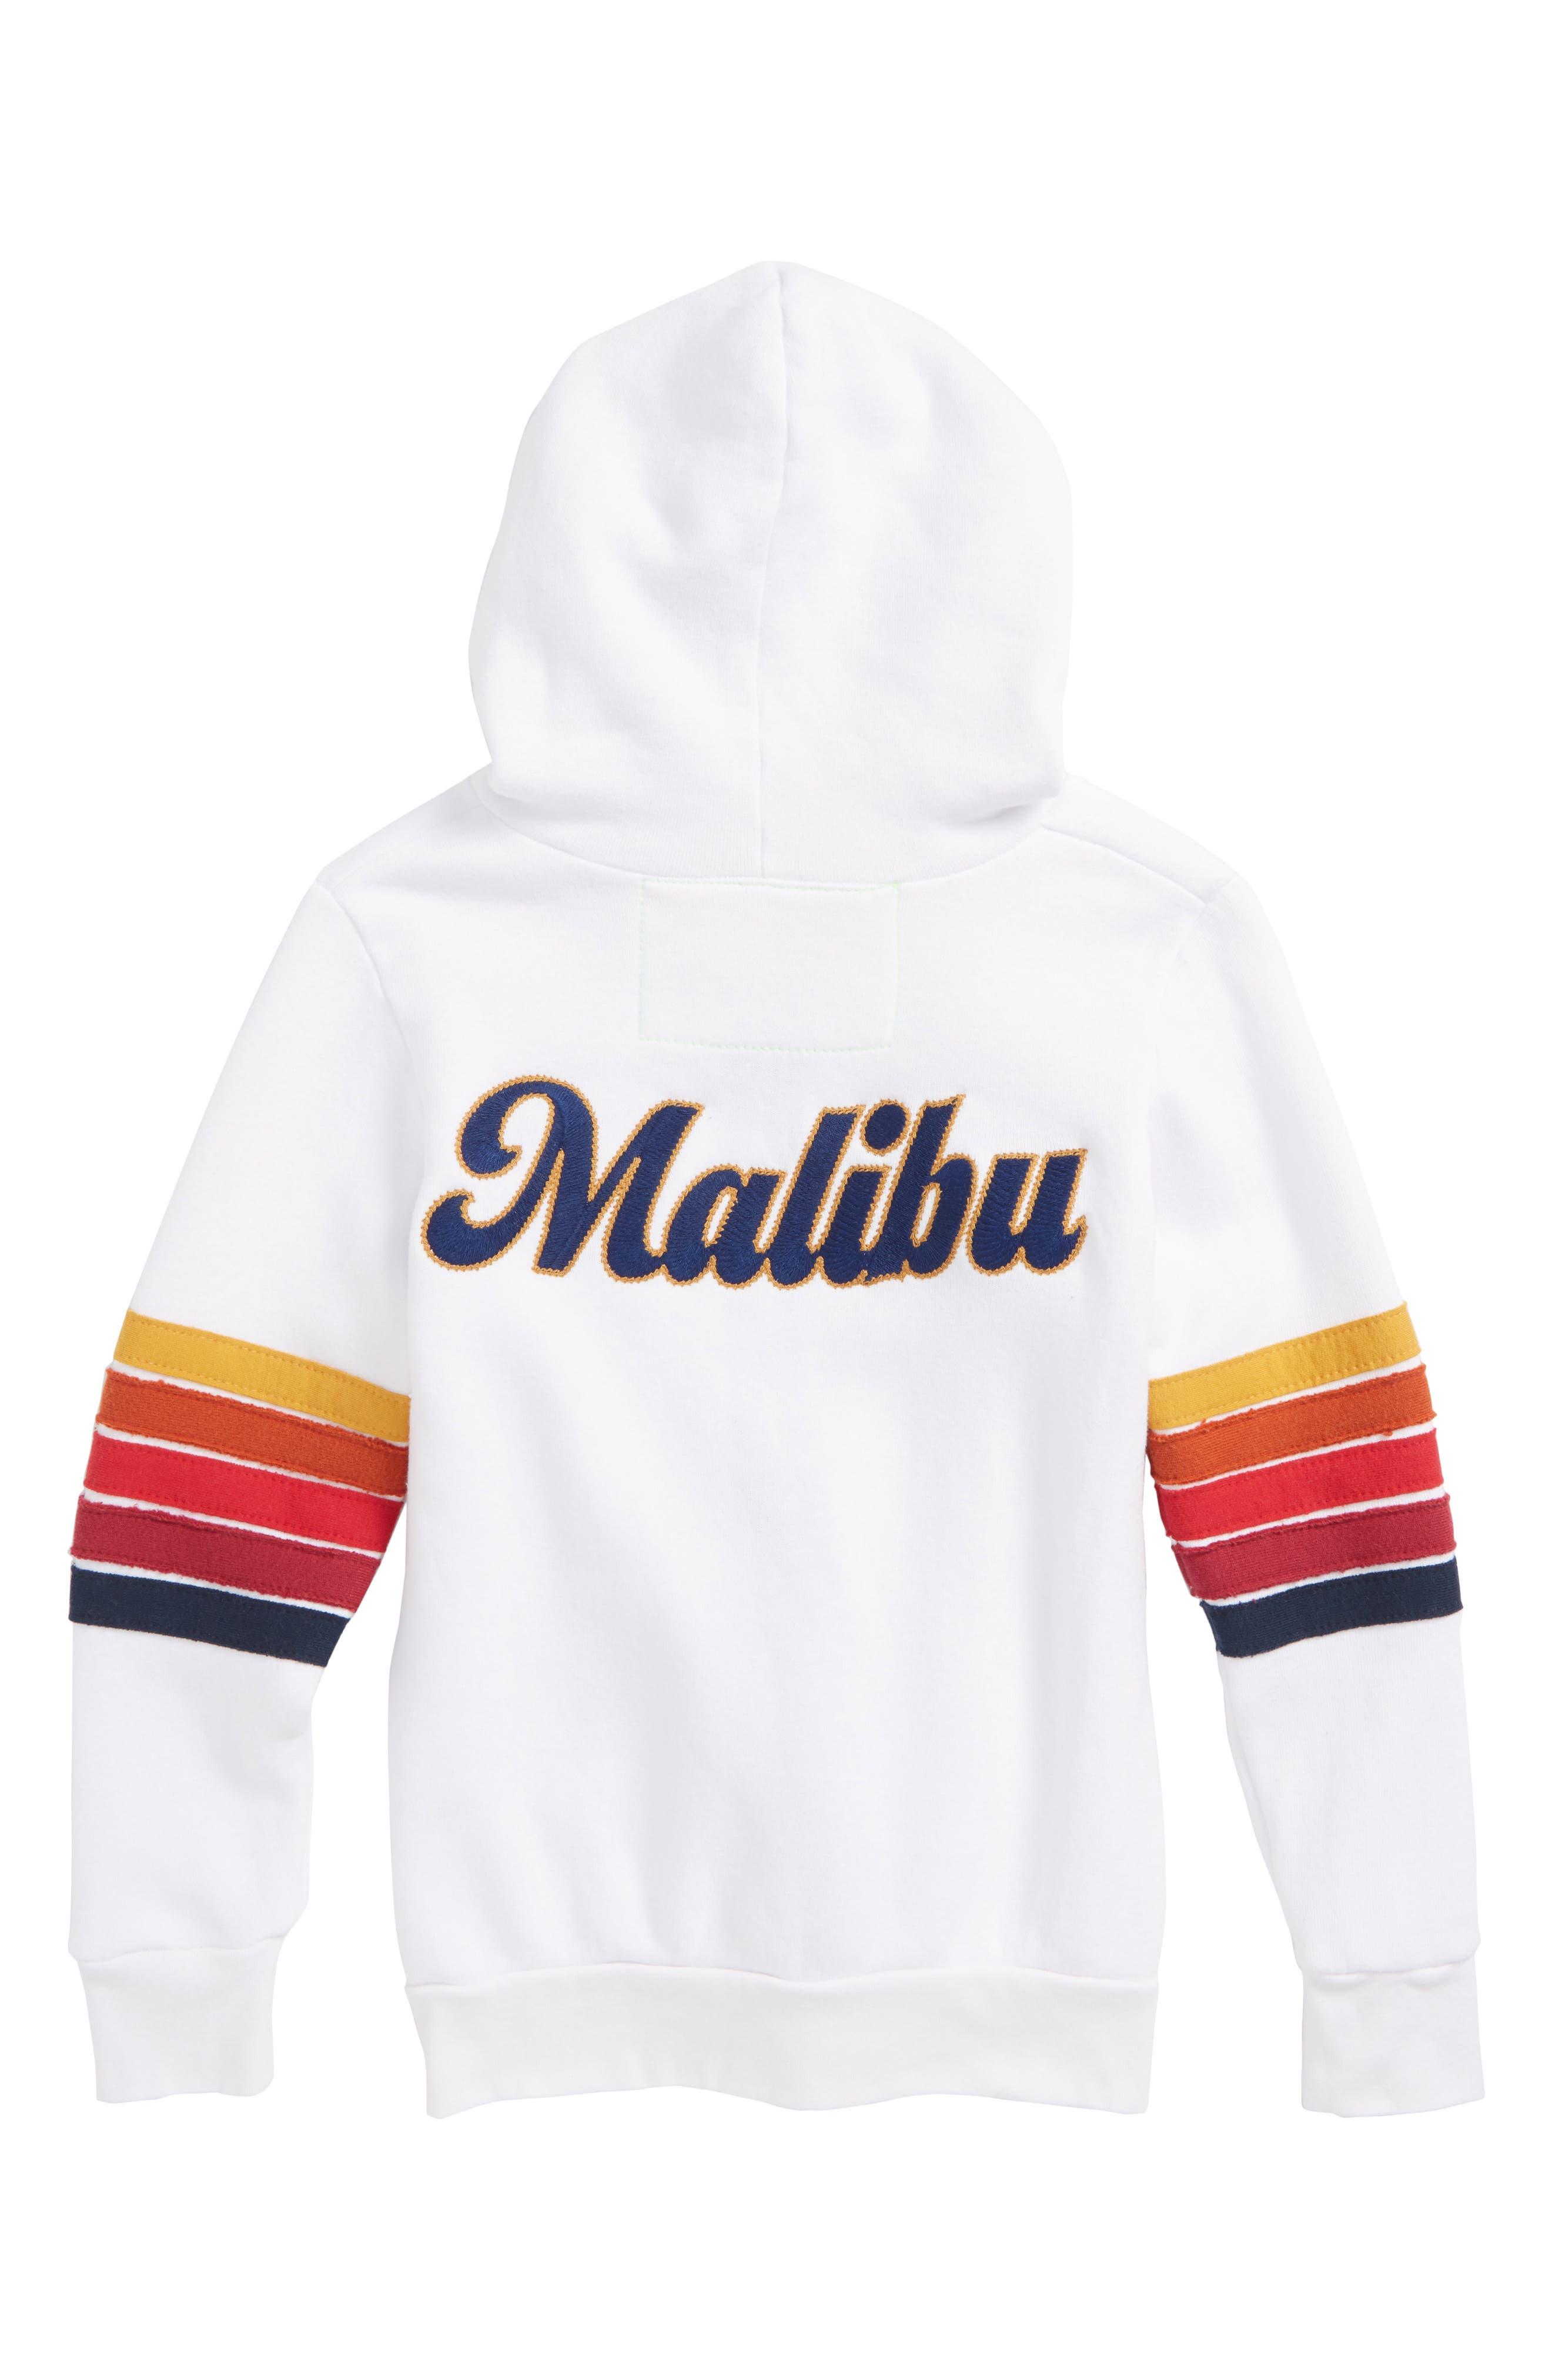 AVIATOR NATION,                             Malibu Zip Hoodie,                             Alternate thumbnail 2, color,                             110